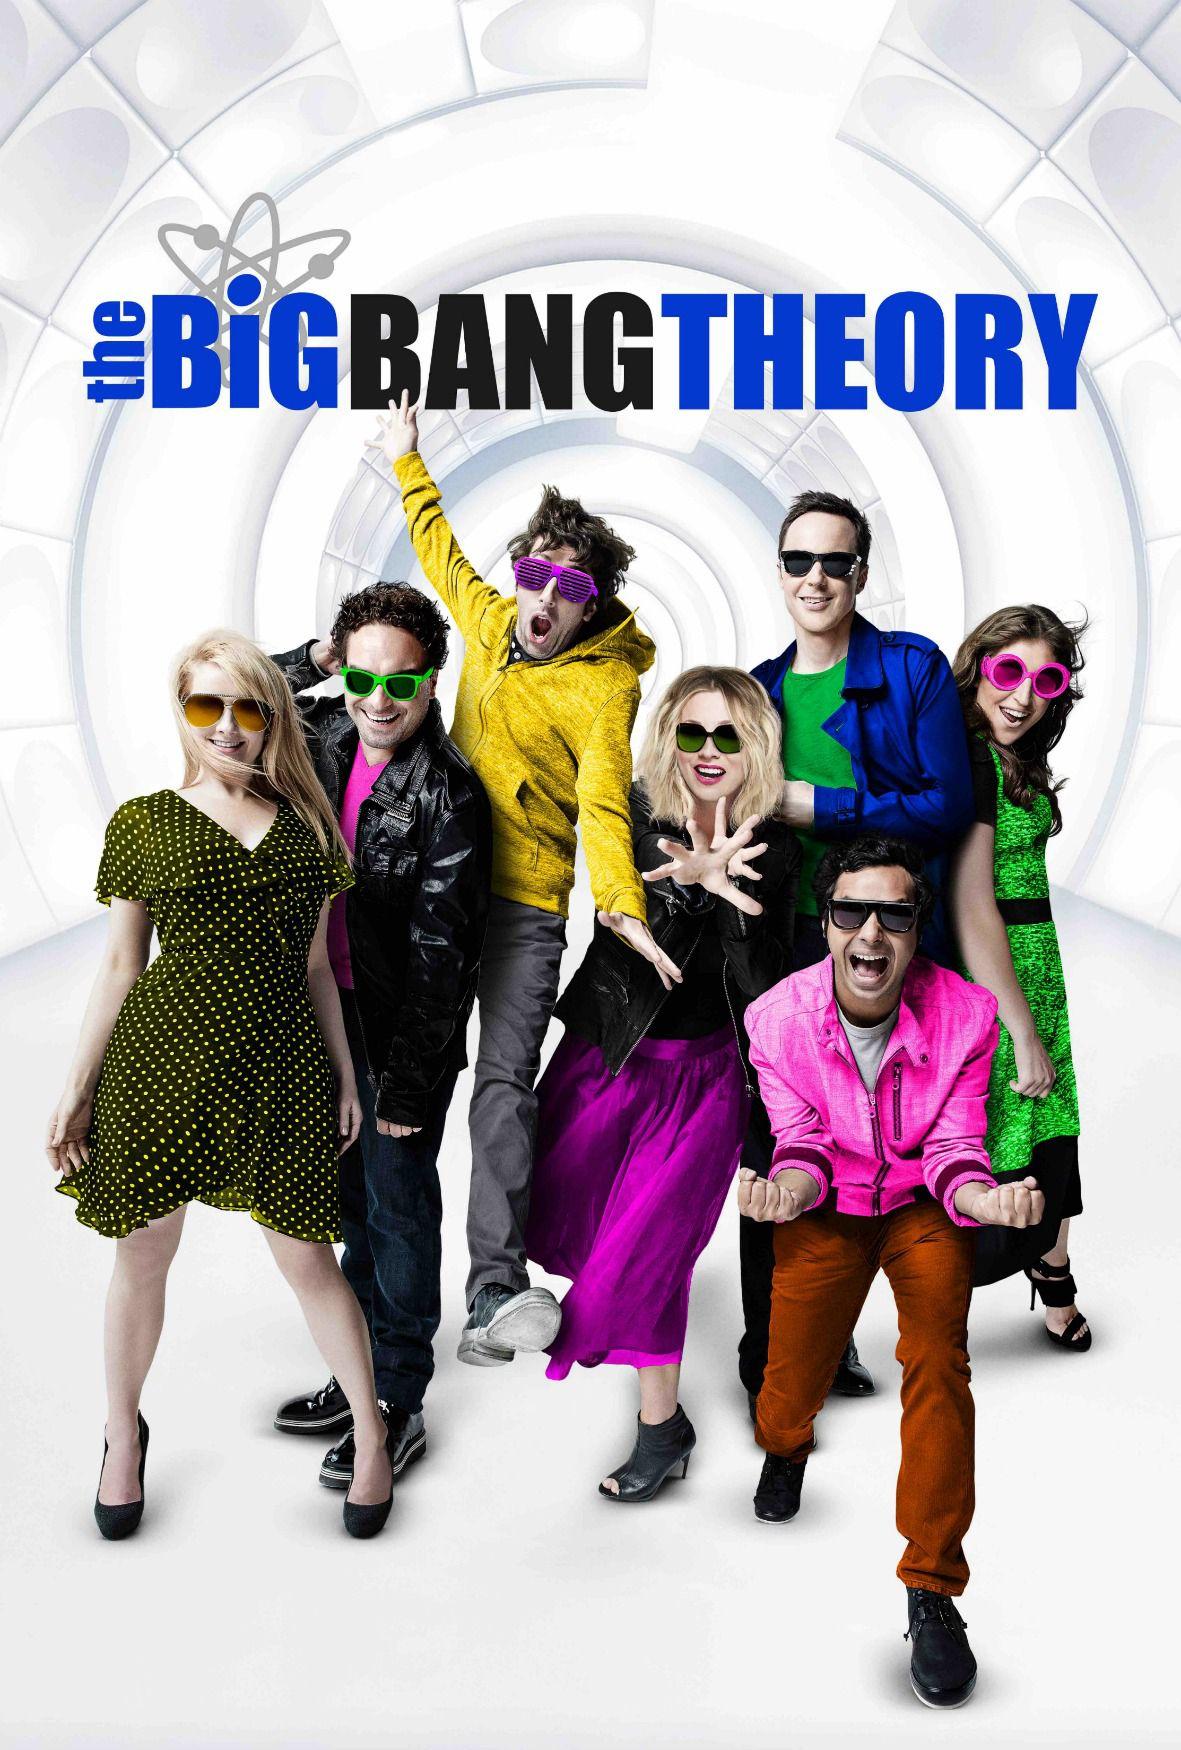 thebigbangtheory10_keyarts